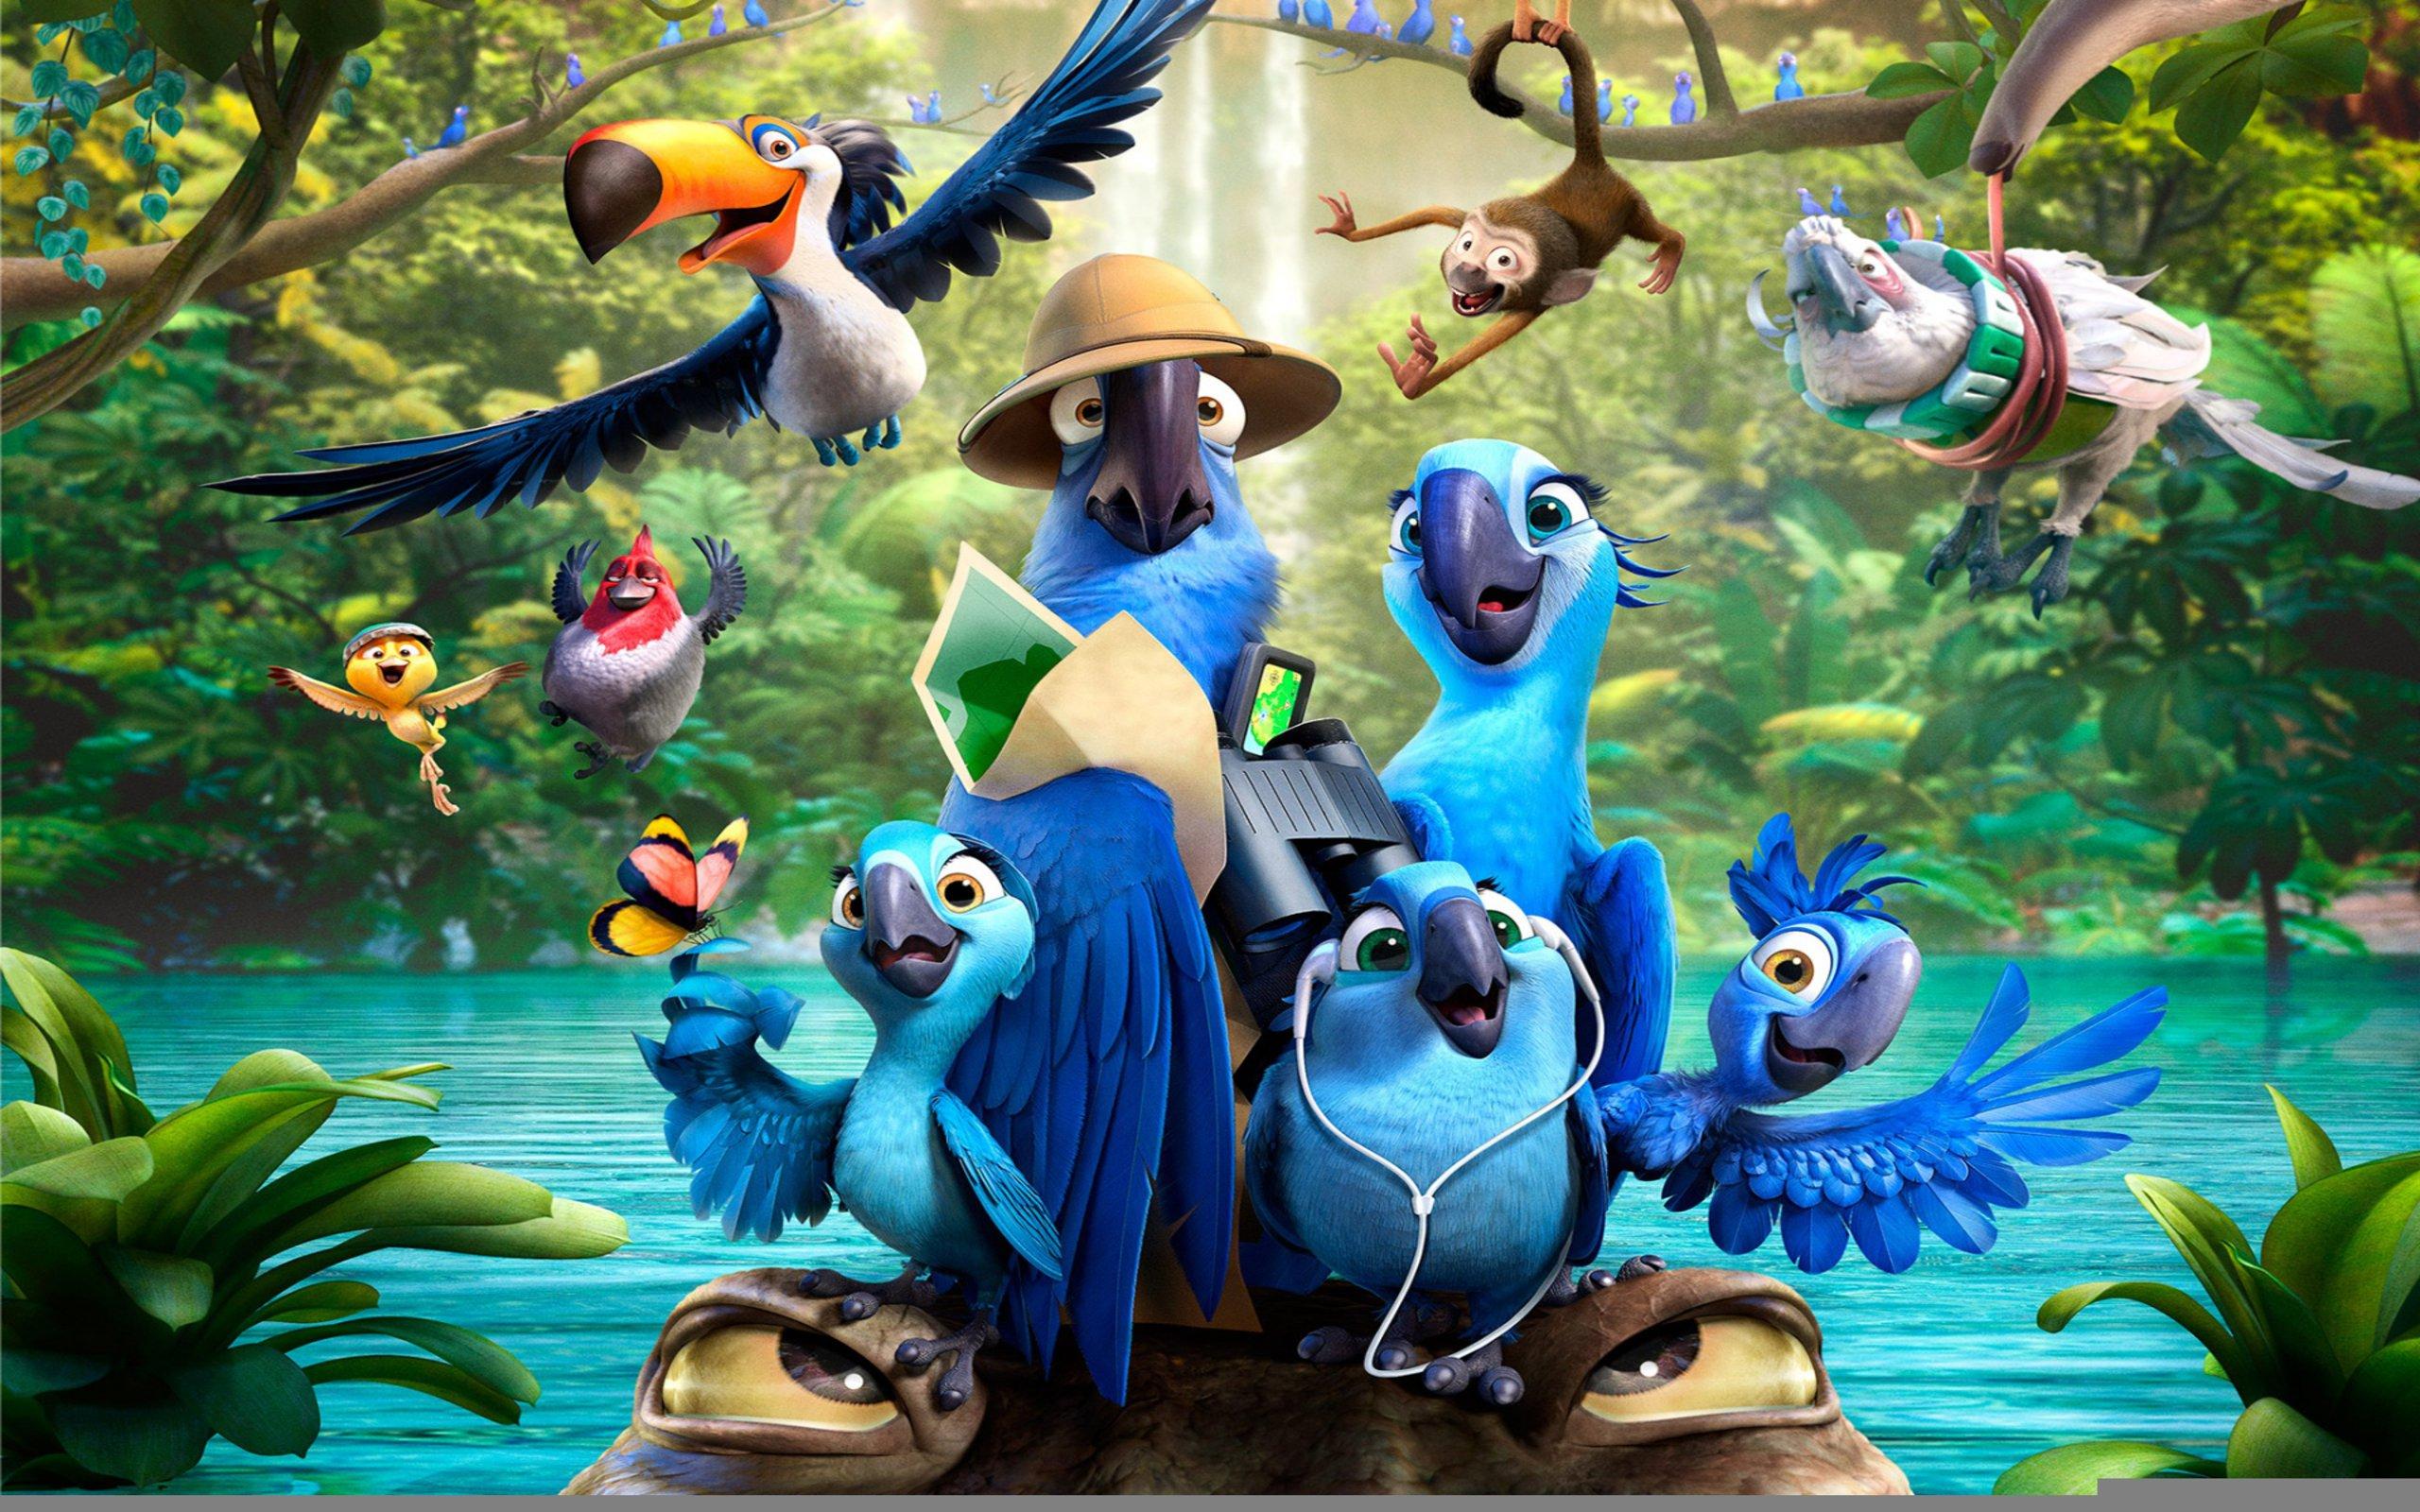 Creature 3d Movie Wallpaper Download Rio 2 Movie Cartoon Wallpaper 2560x1600 9576